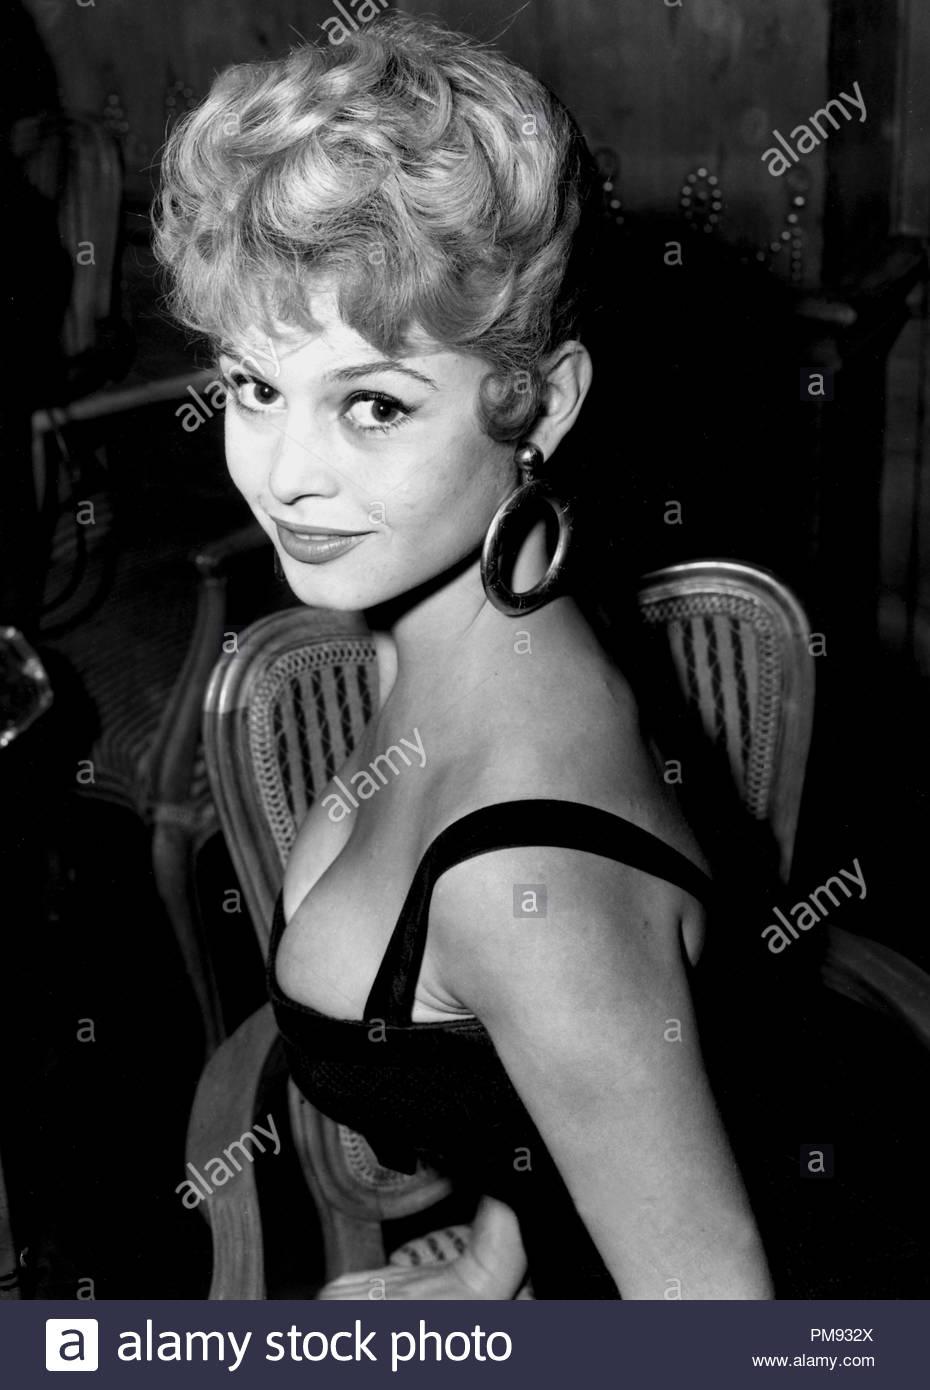 brigitte-bardot-circa-1951-file-reference-31537-397tha-PM932X